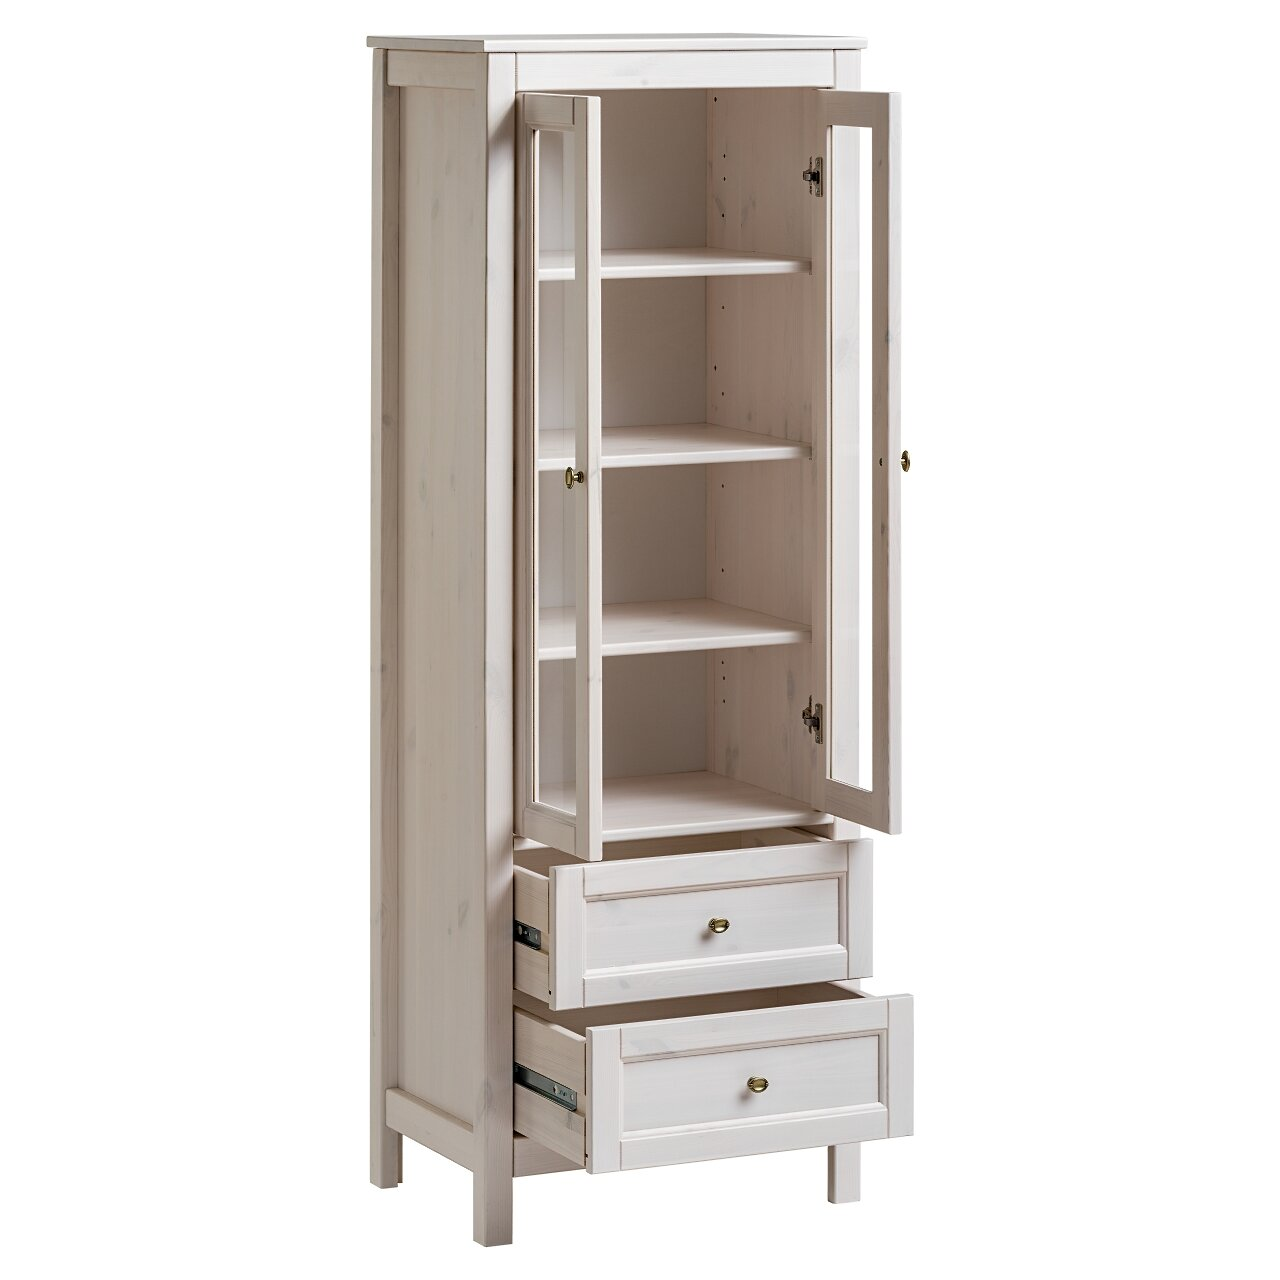 Holiday Kitchen Cabinets Belfry Bathroom Royal 55 X 155cm Free Standing Bathroom